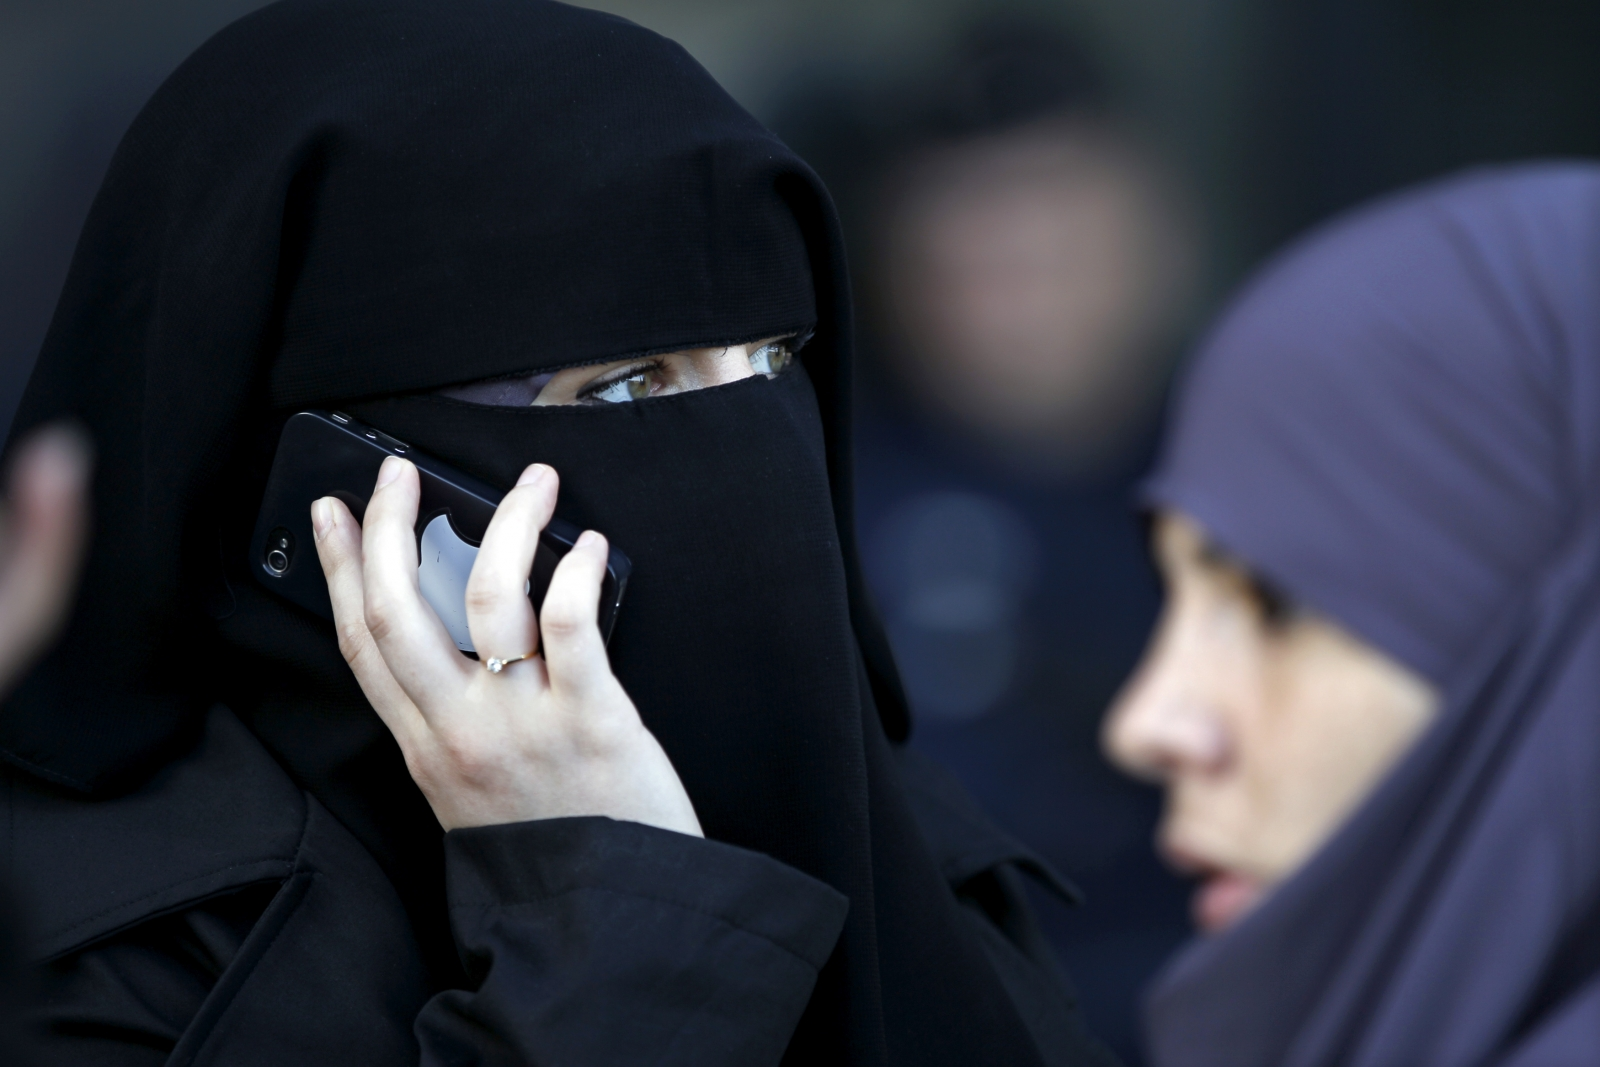 France Muslim Woman Niqab